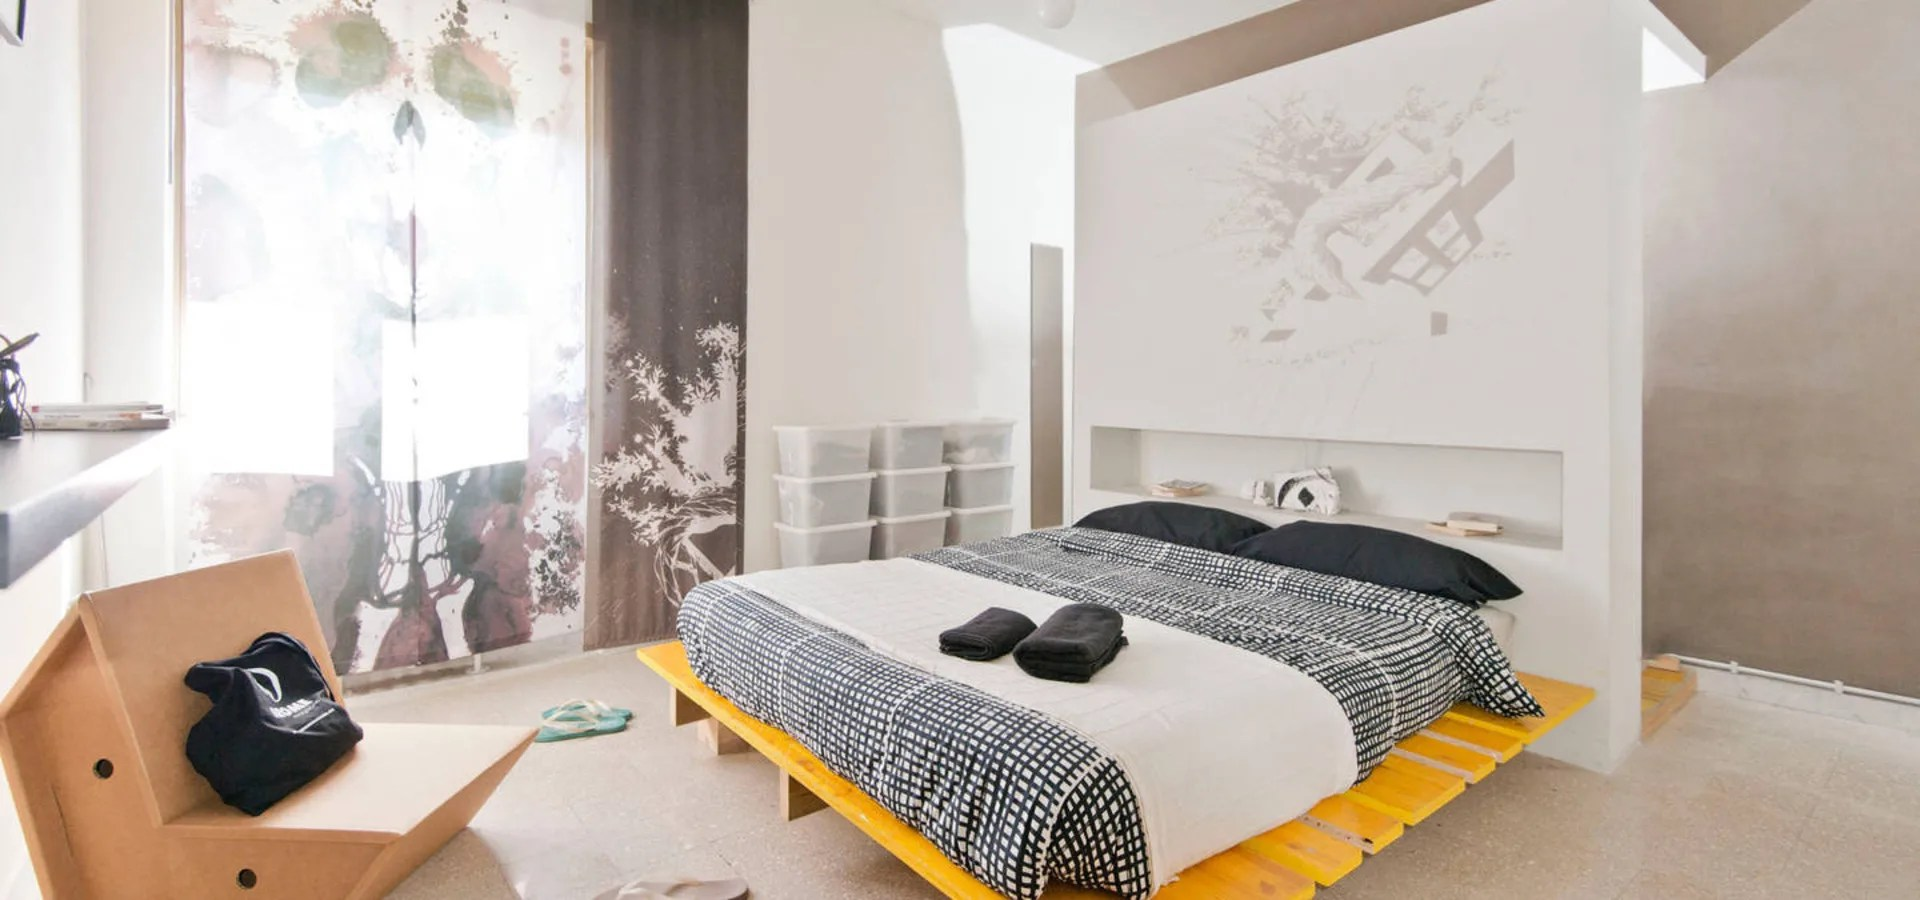 Schlafzimmer Roma | Hotel Antico Palazzo Rospigliosi Rom Offizielle ...